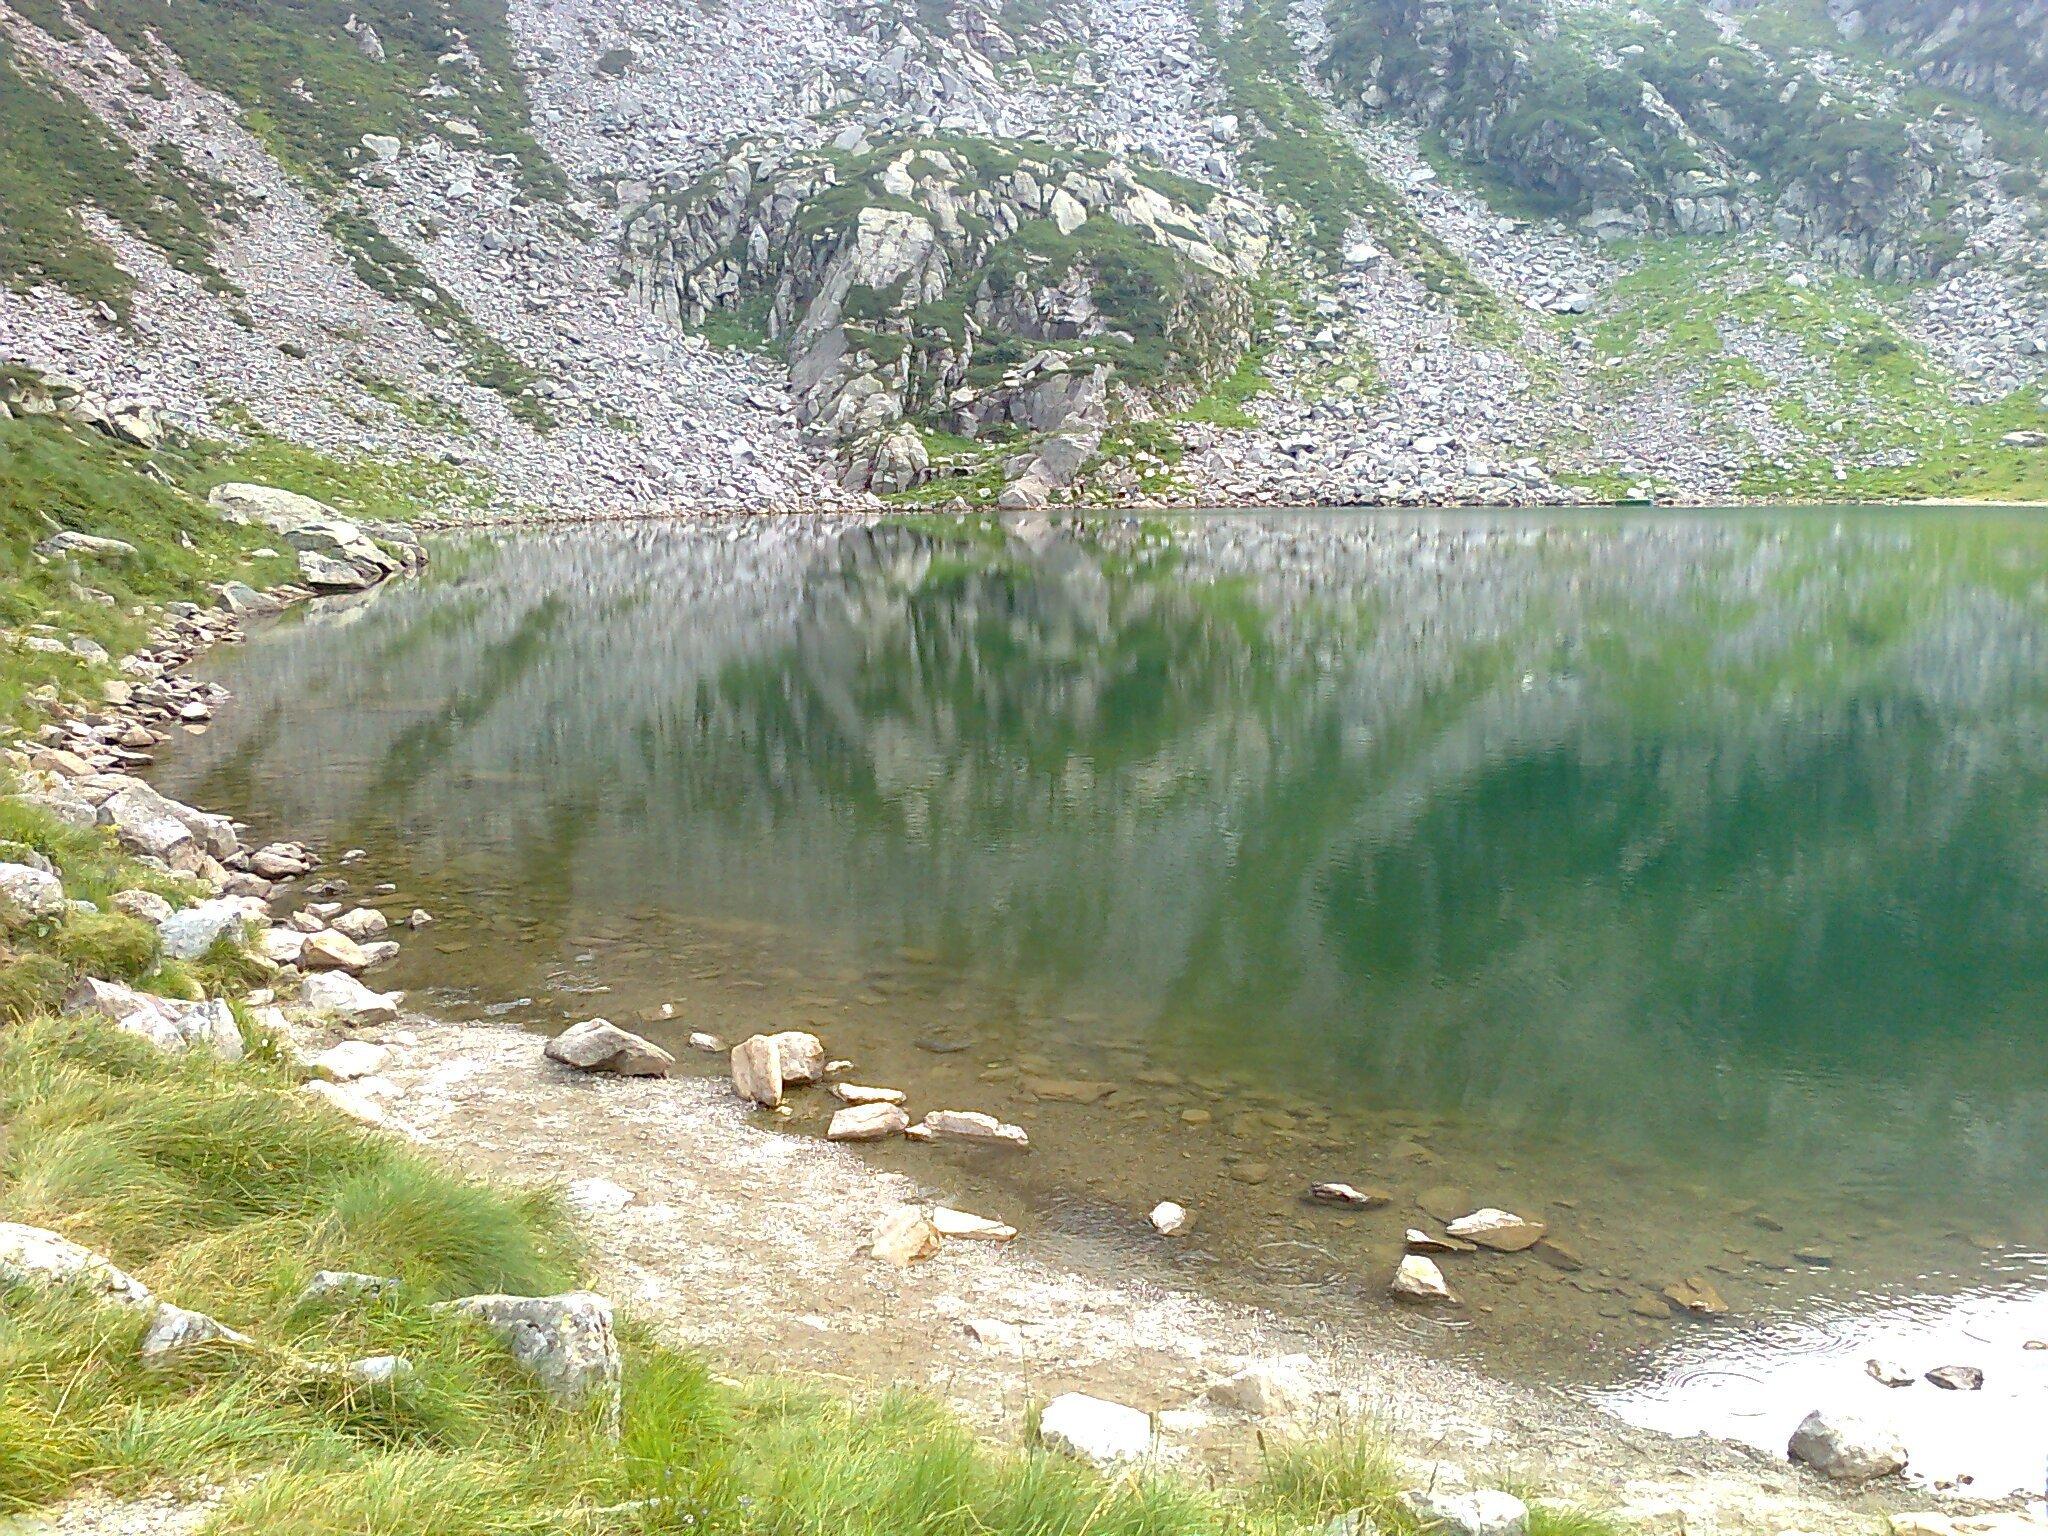 a lake in the mountains 3 1440x1080 - A lake in the mountains